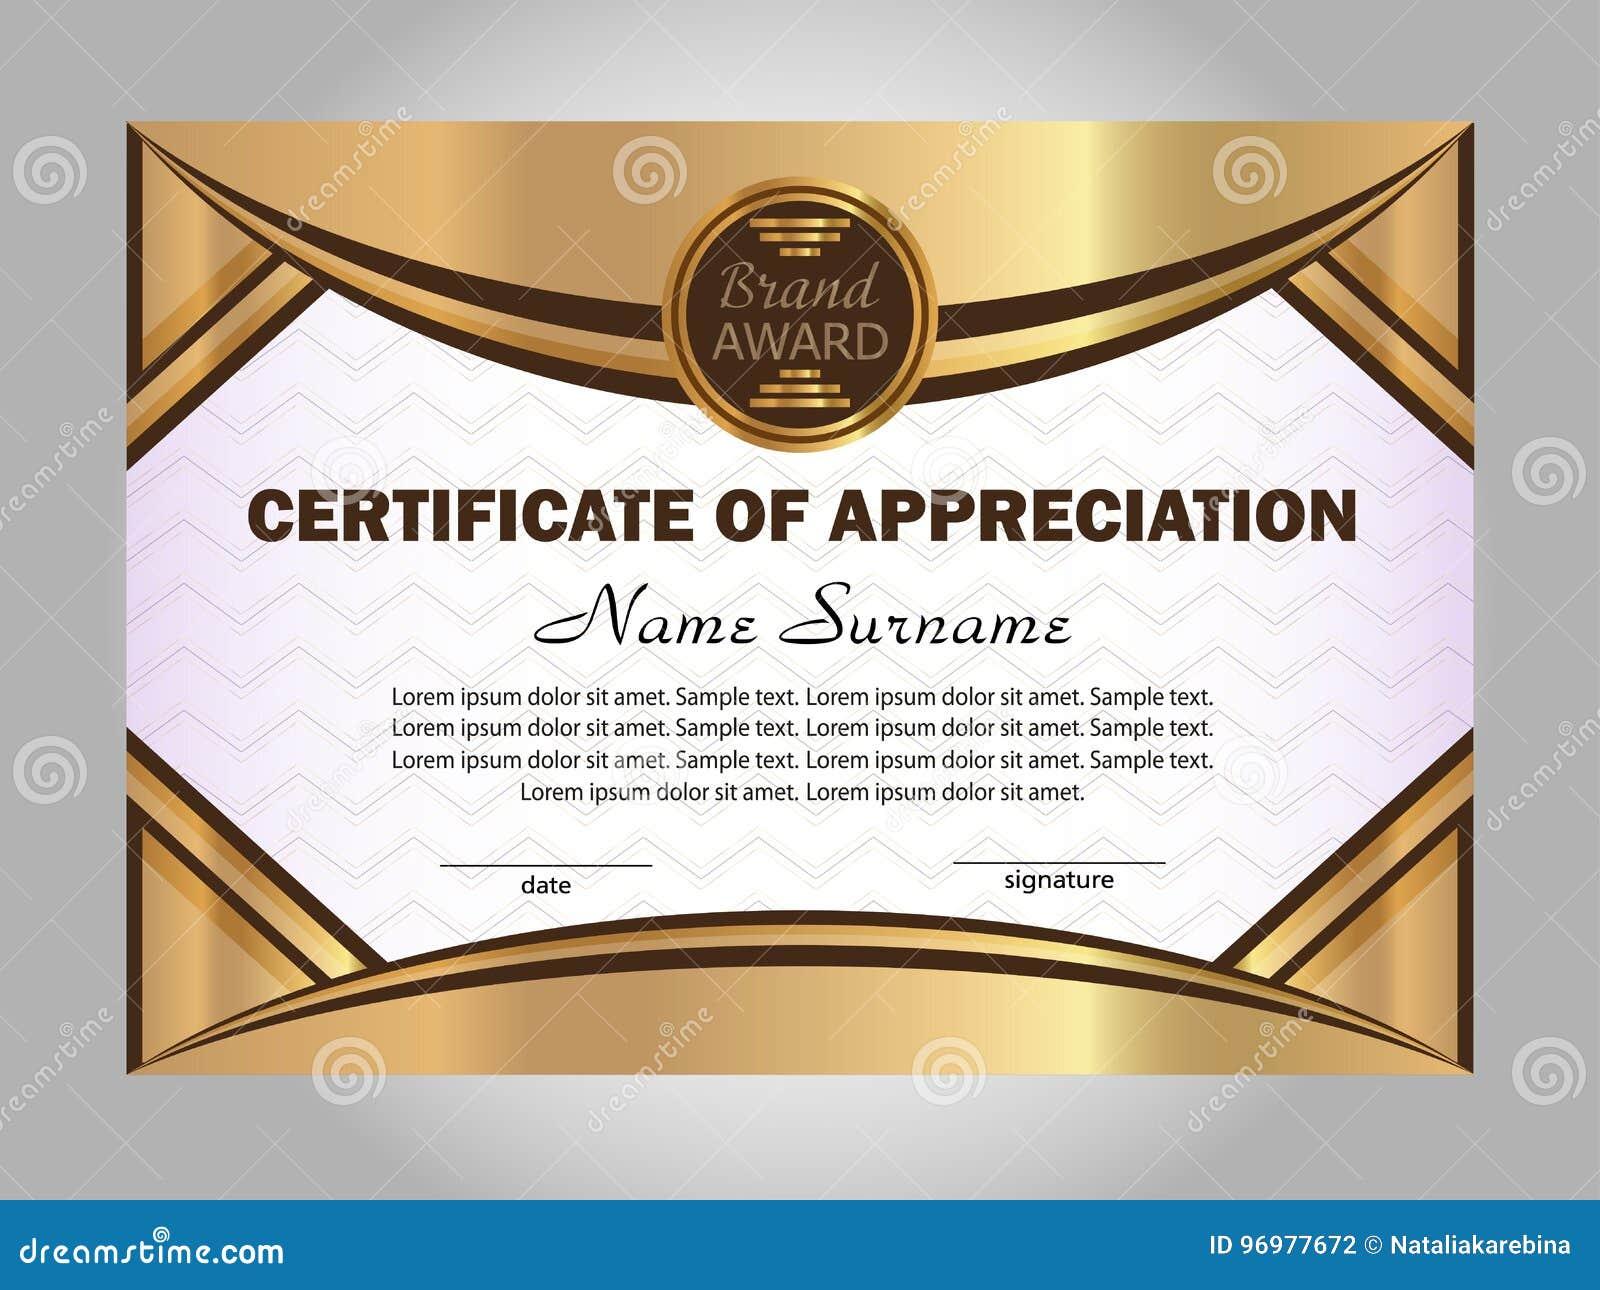 Certificate of Appreciation. Gold Template. Elegant Background For Certificates Of Appreciation Template